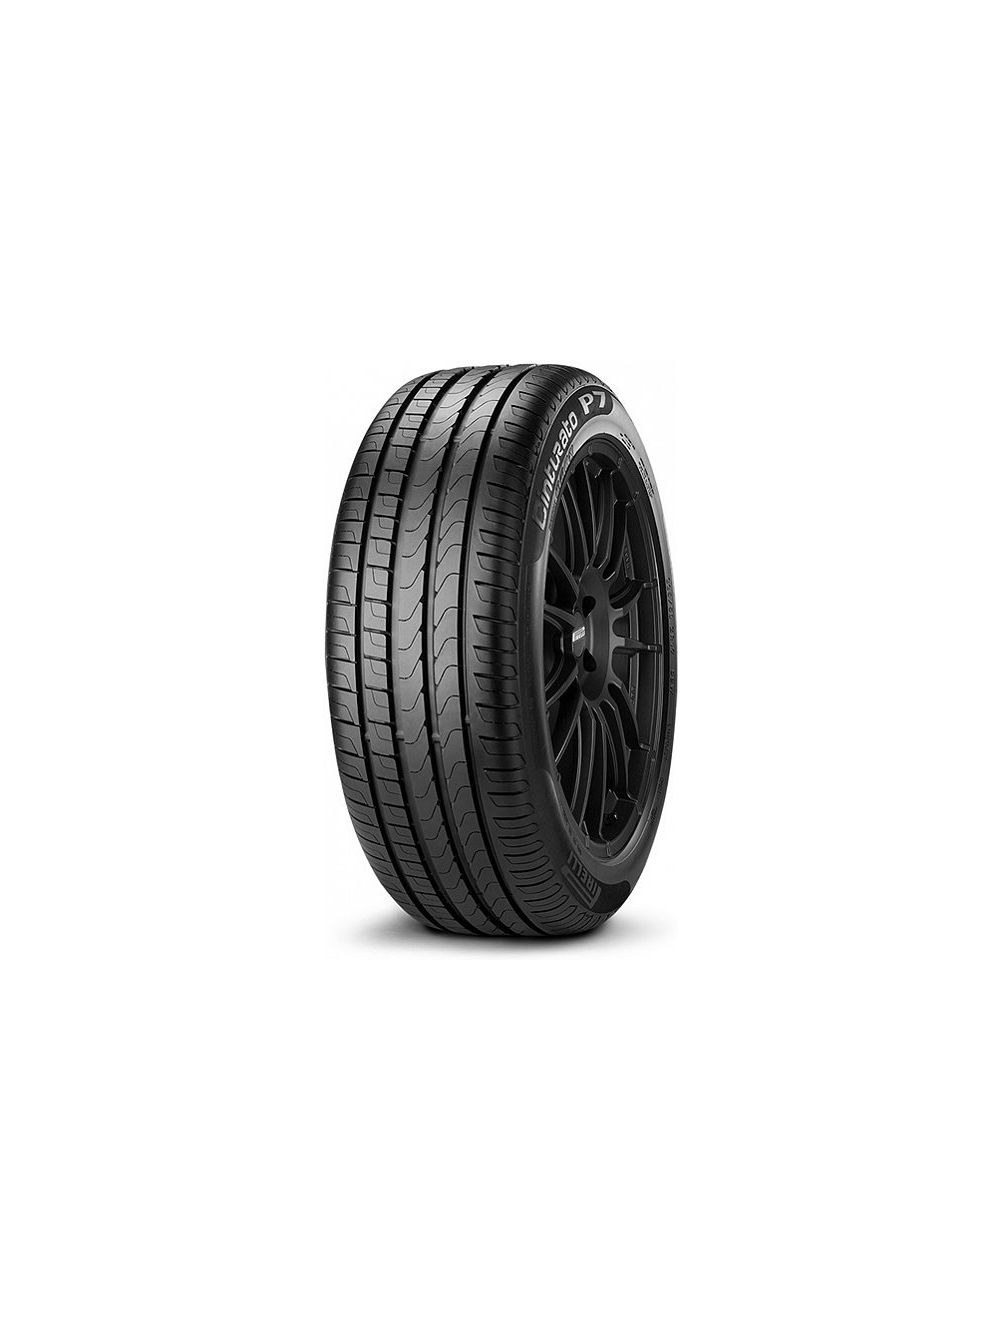 Pirelli 205/40R18 W P7 Cinturato XL RunFlat *Eco Nyári gumi